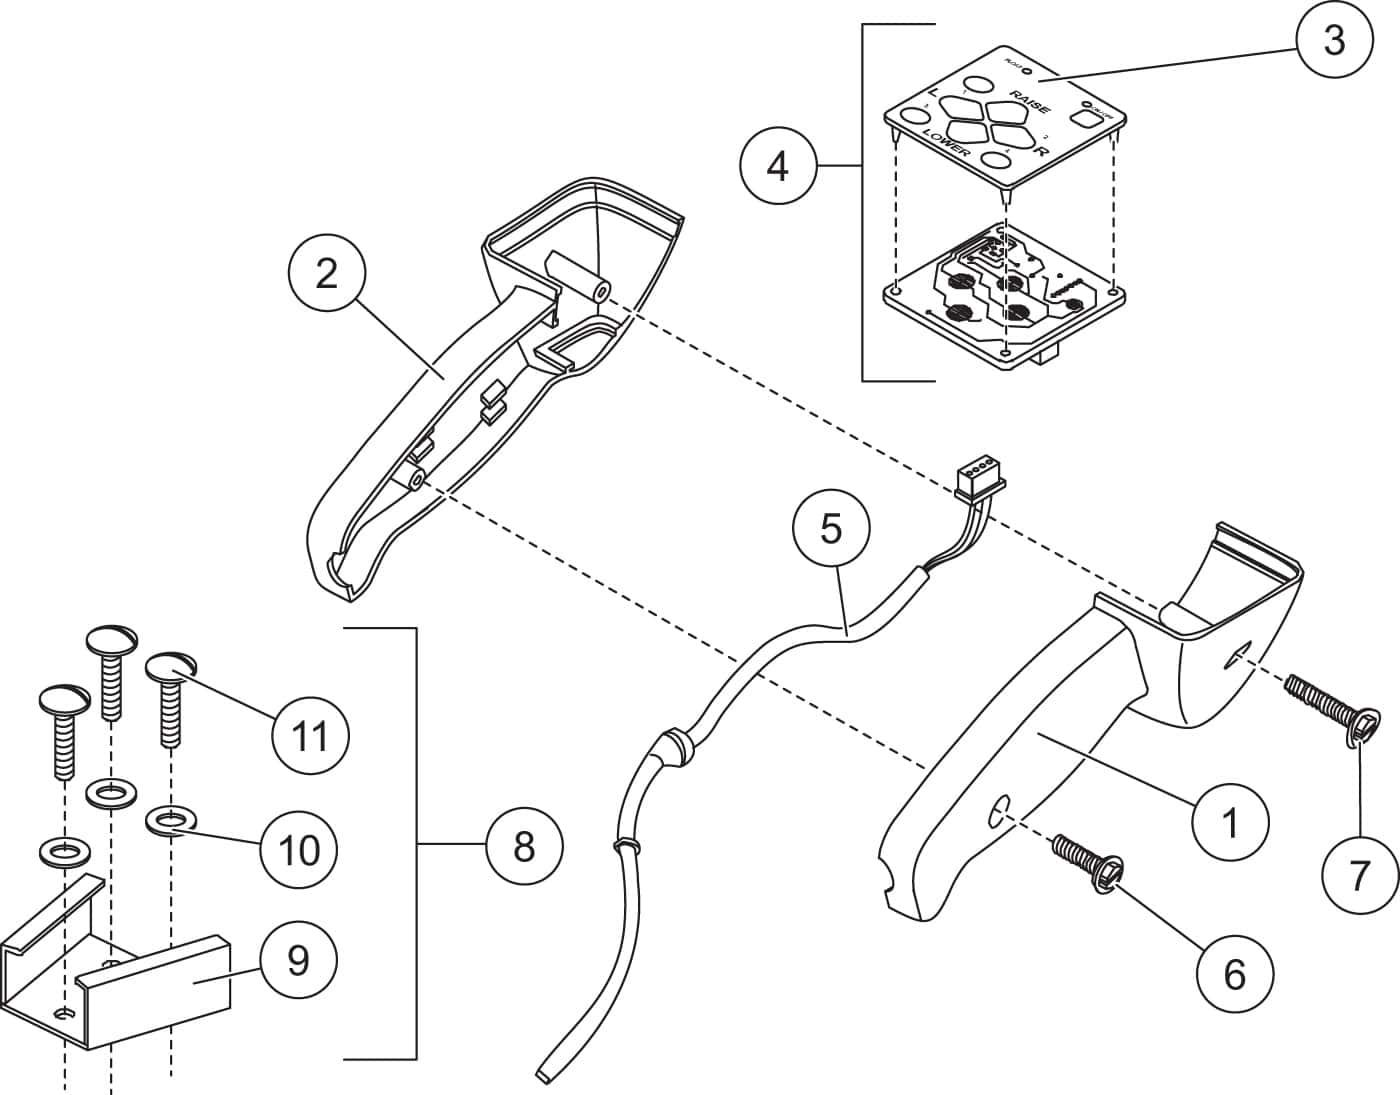 Xblade fish stik hand held control diagram